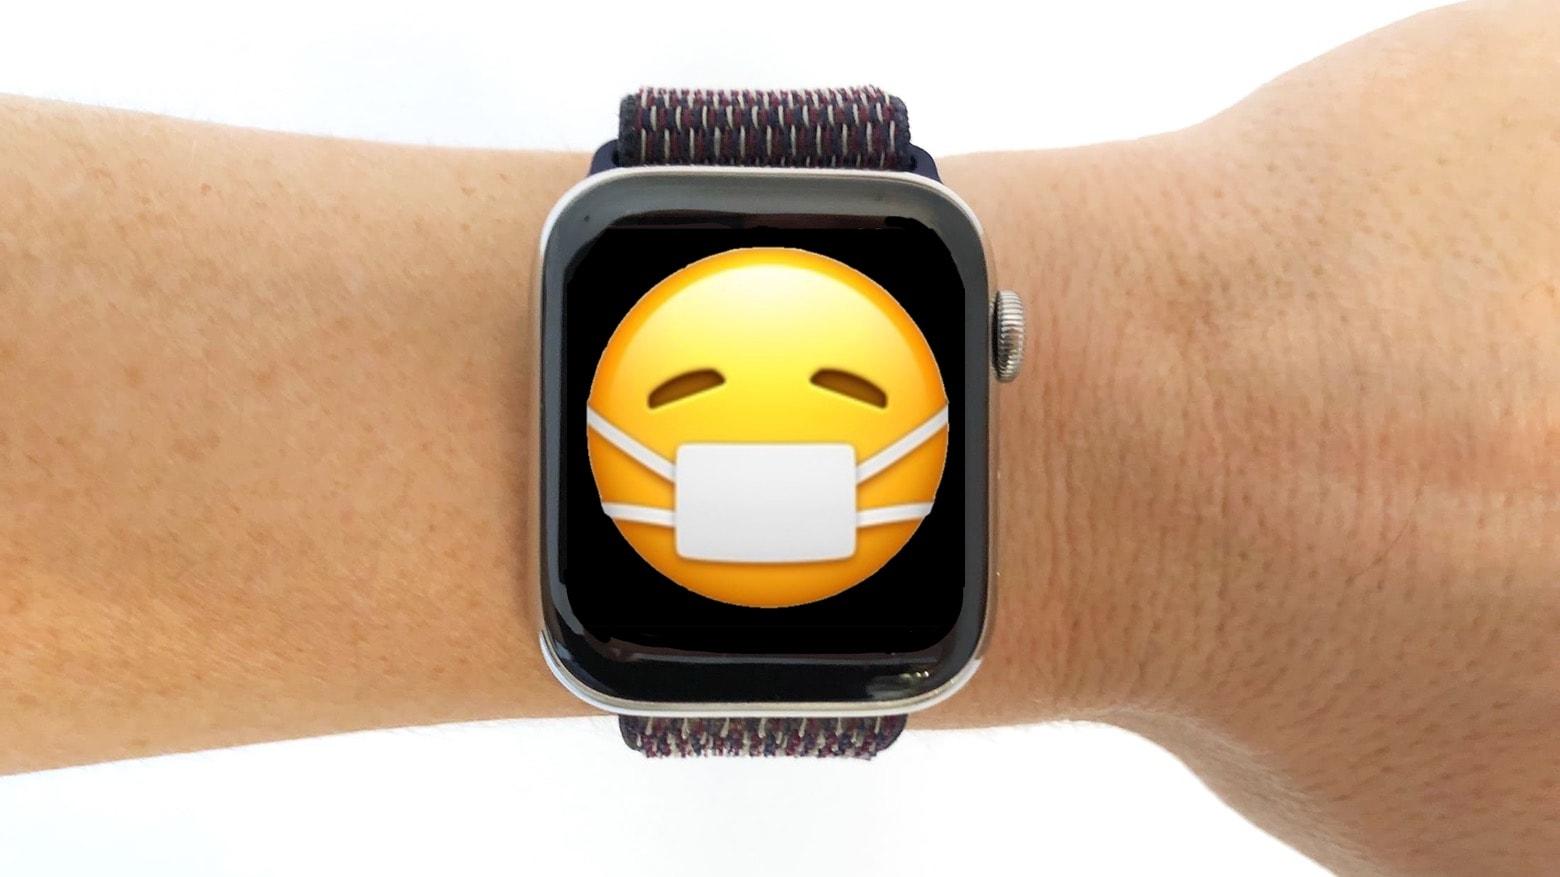 Apple Watch Sick Mode